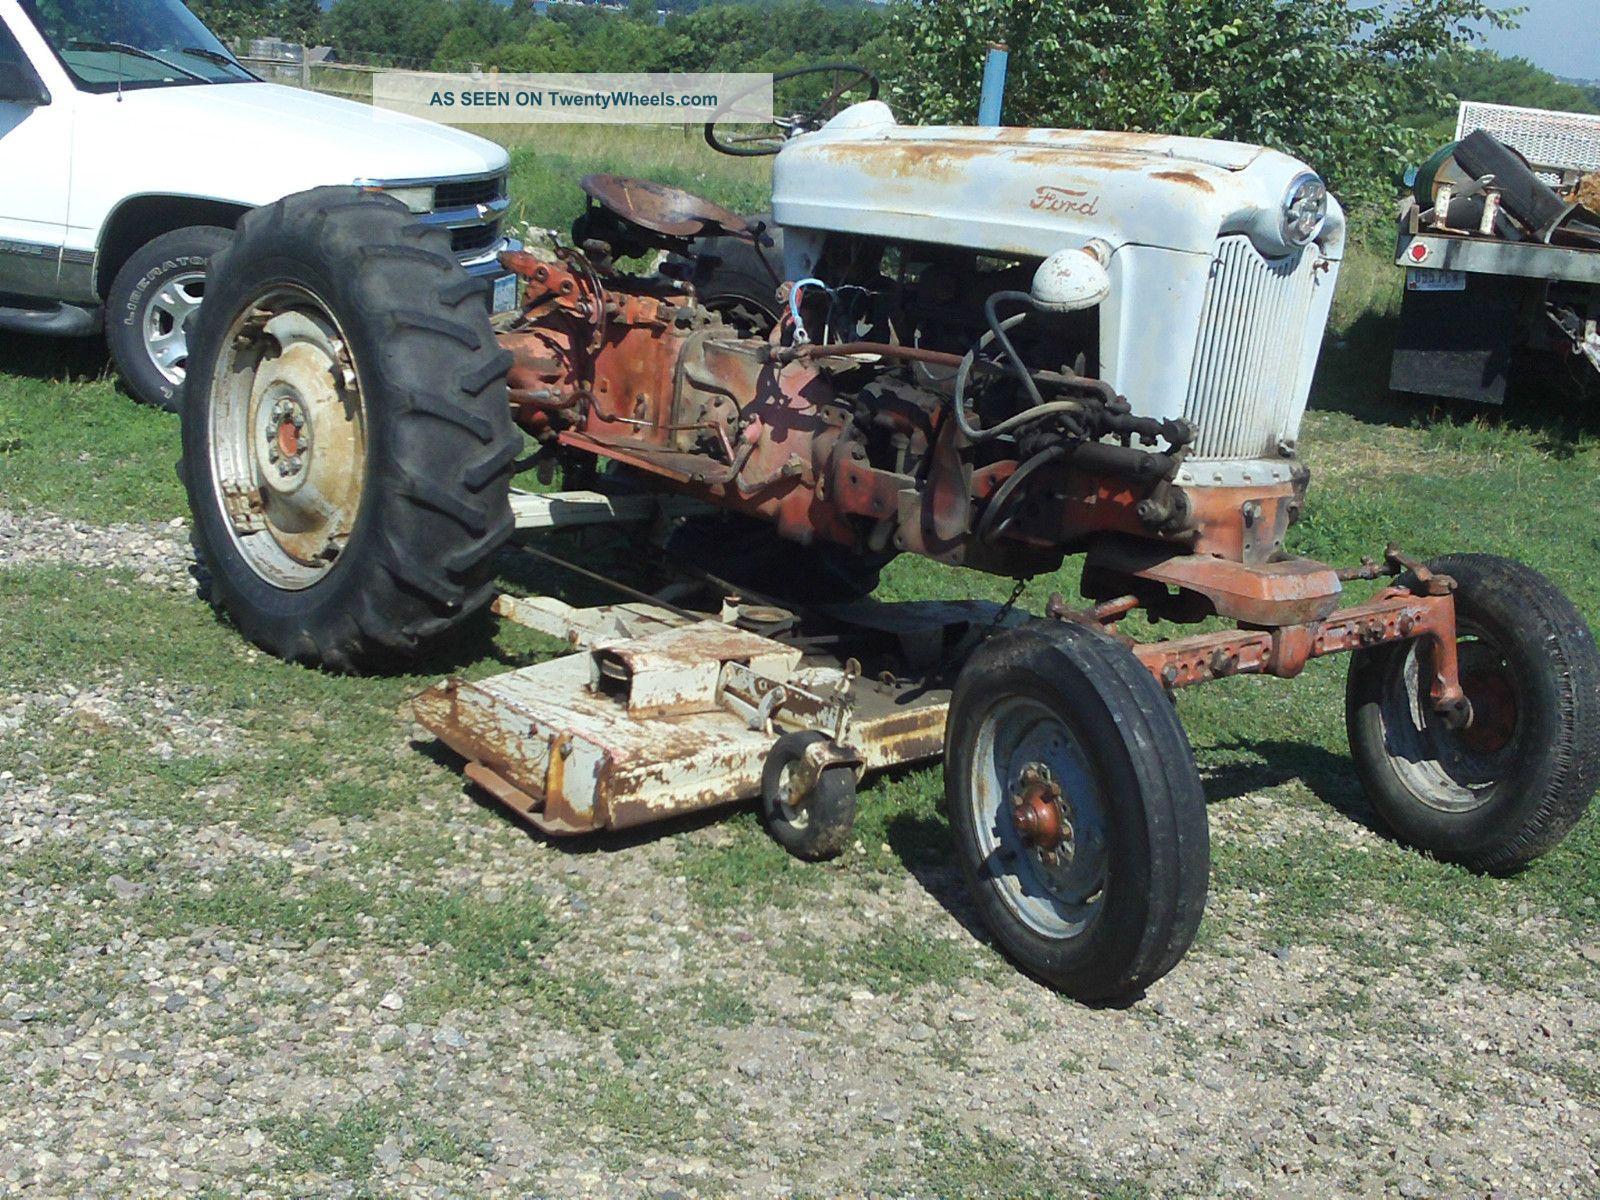 Ford Backhoe Craigslist Autos Weblog